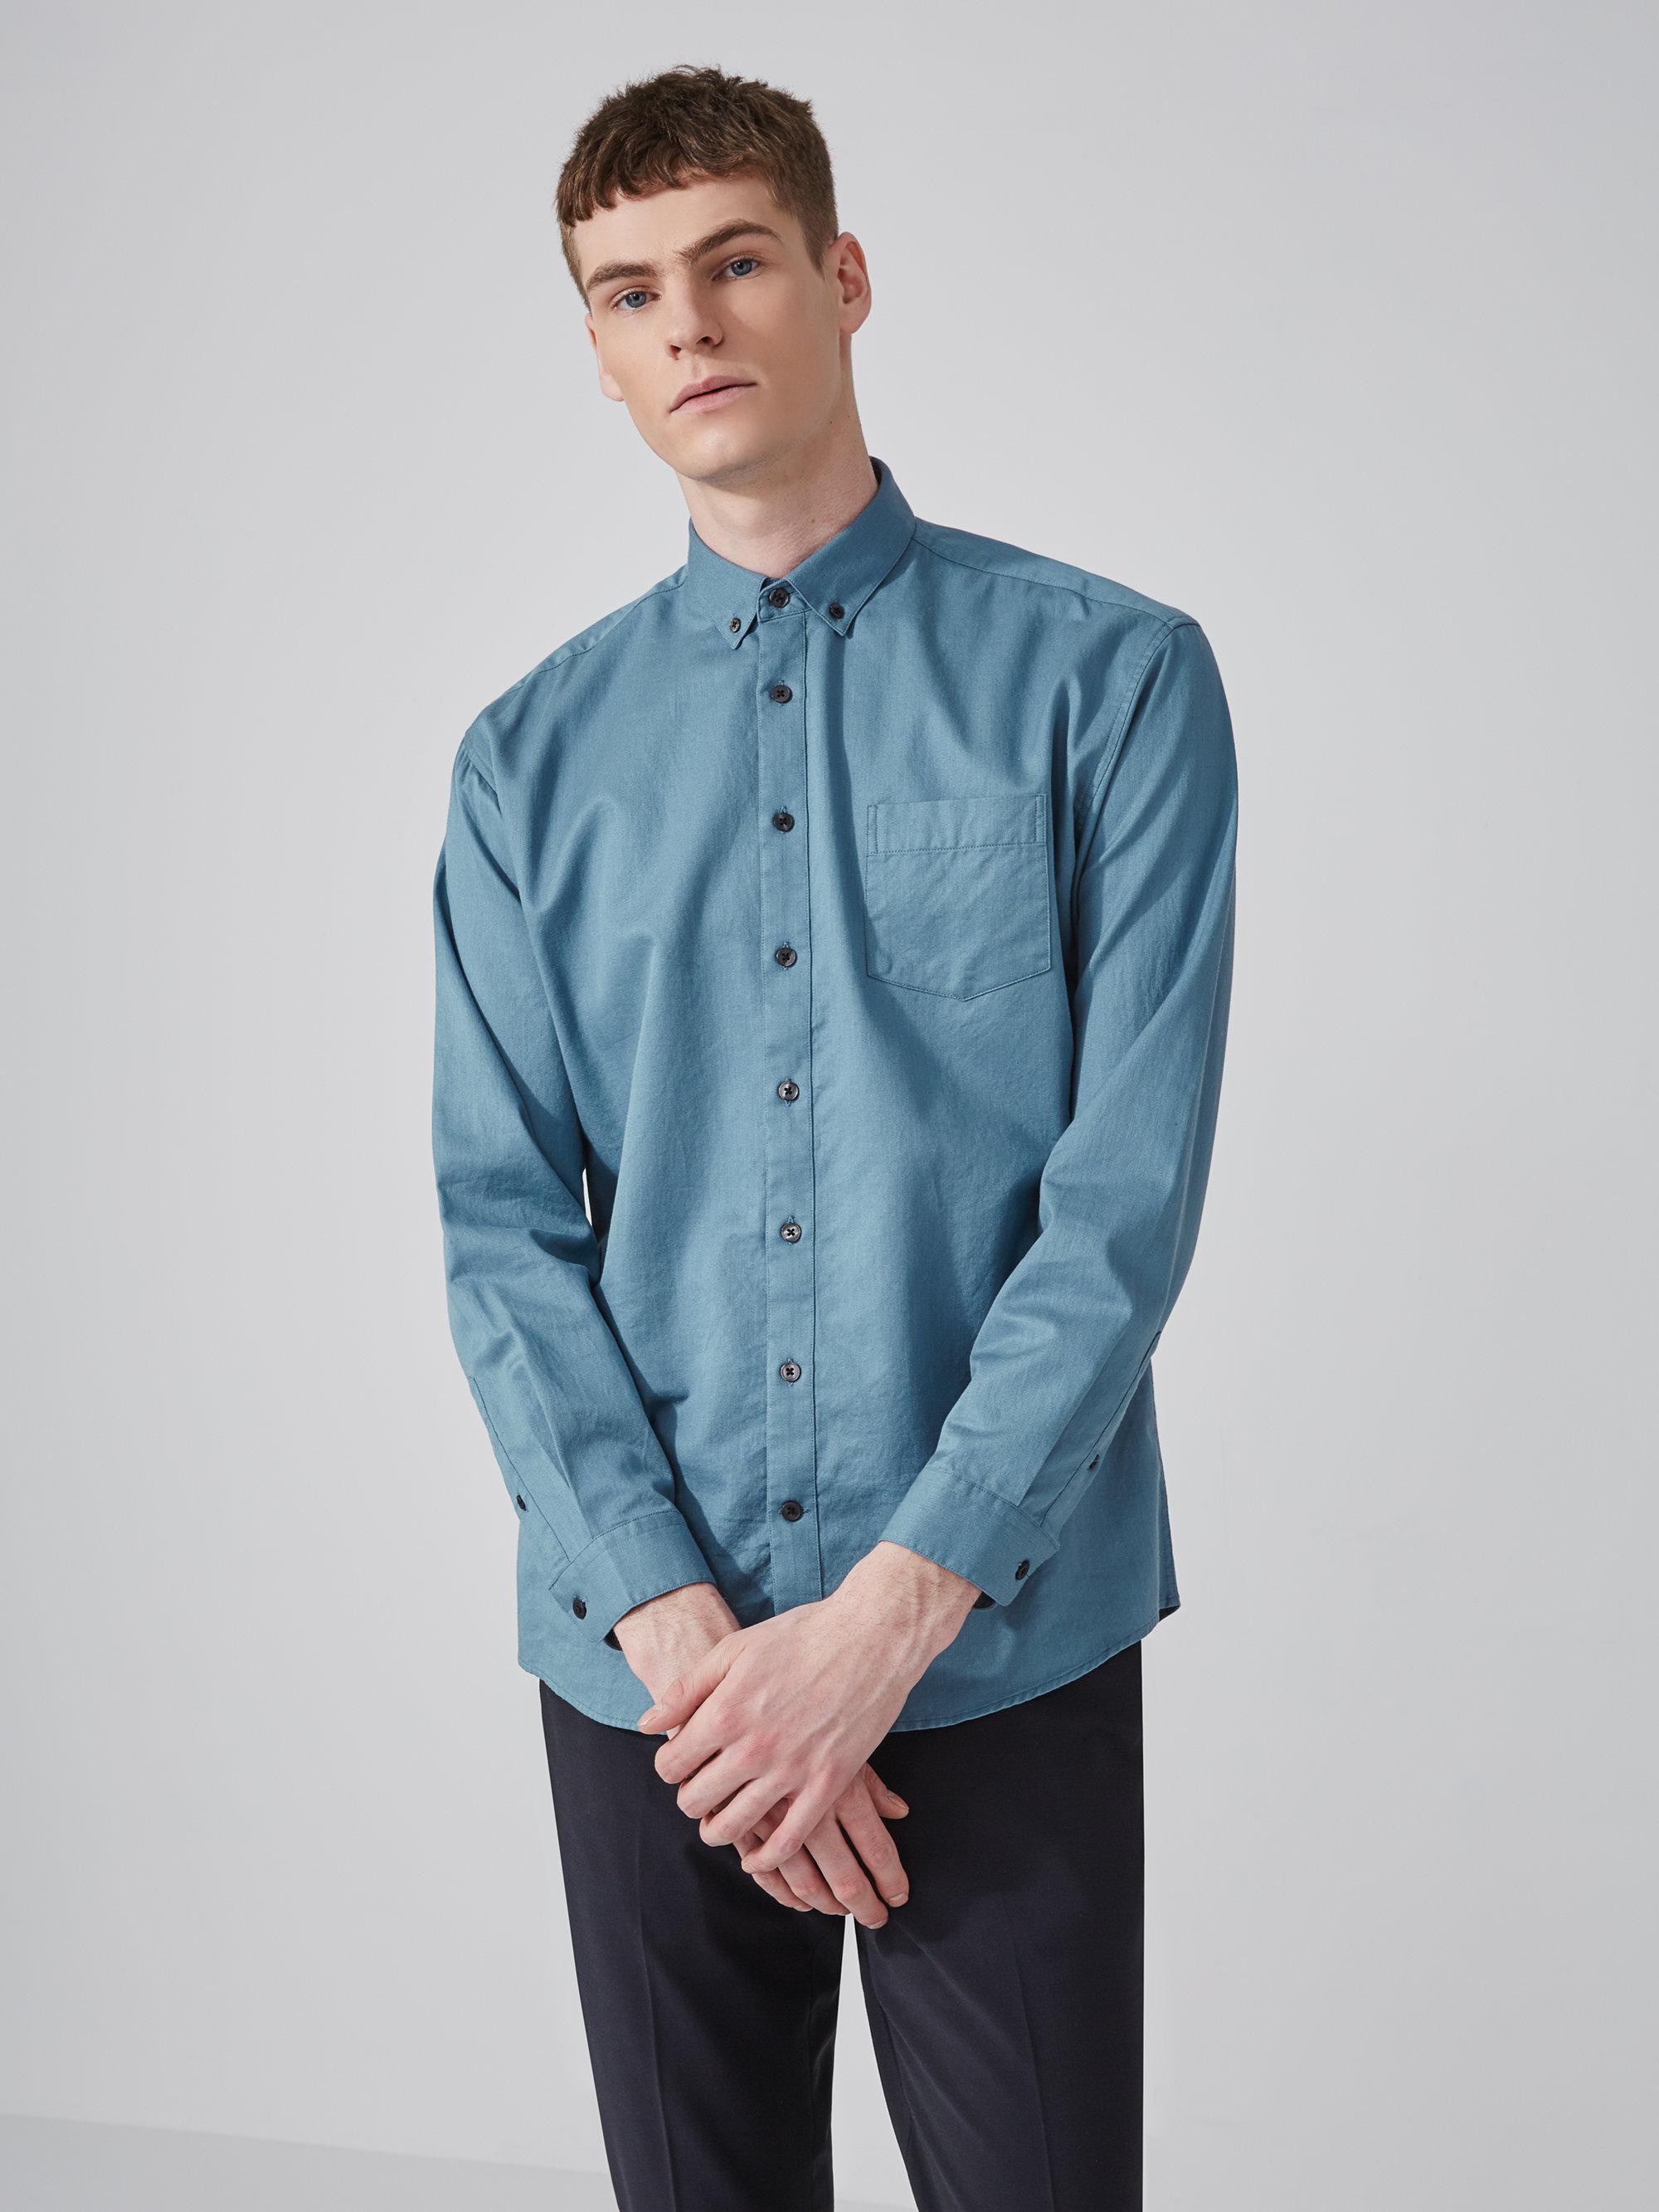 Frank oak oversized cotton tencel shirt in blue stone in for Frank and oak shirt